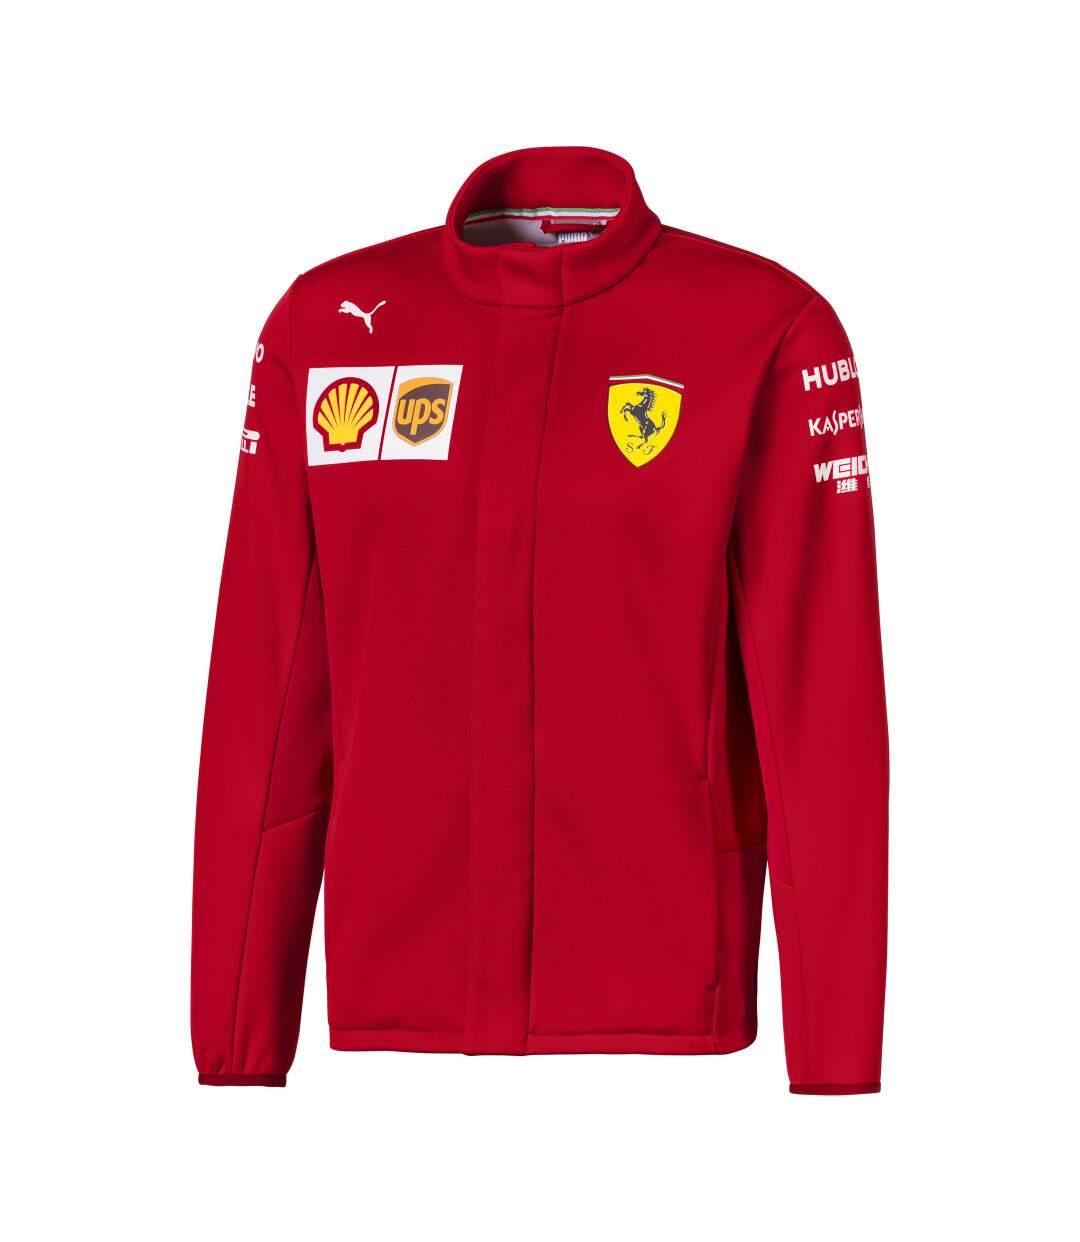 Veste rouge homme Puma Ferrari SF Team Softshell